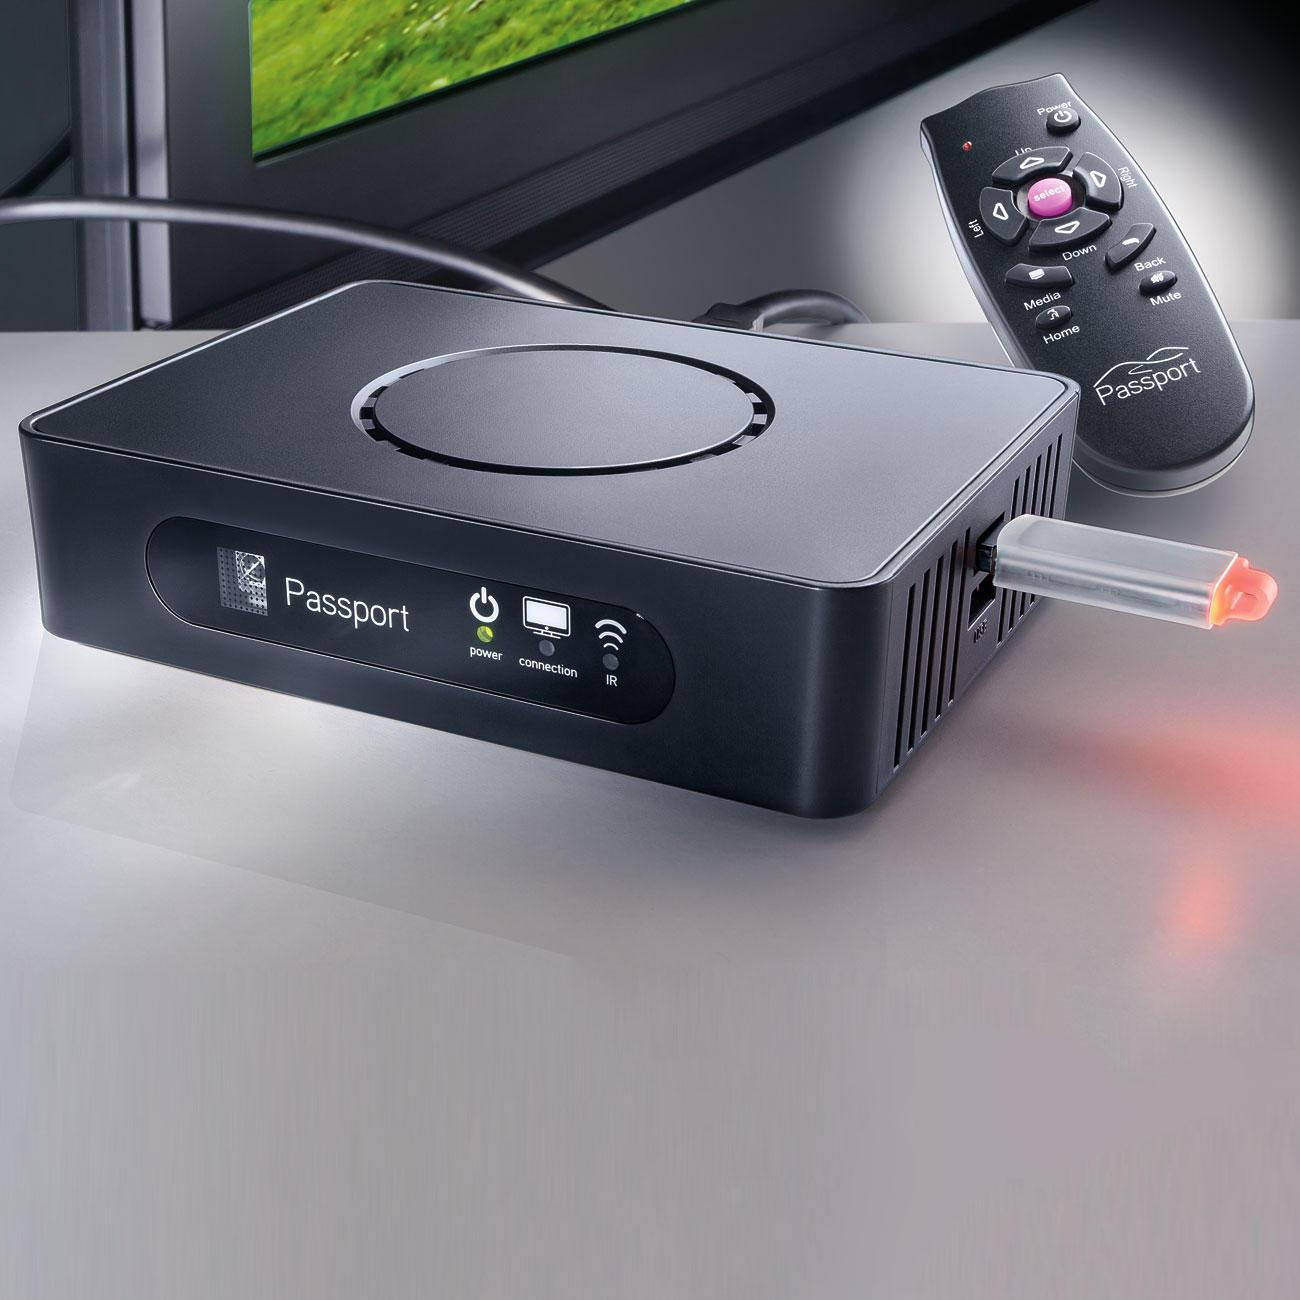 horizon fitness laufband paragon 6 inkl media player. Black Bedroom Furniture Sets. Home Design Ideas